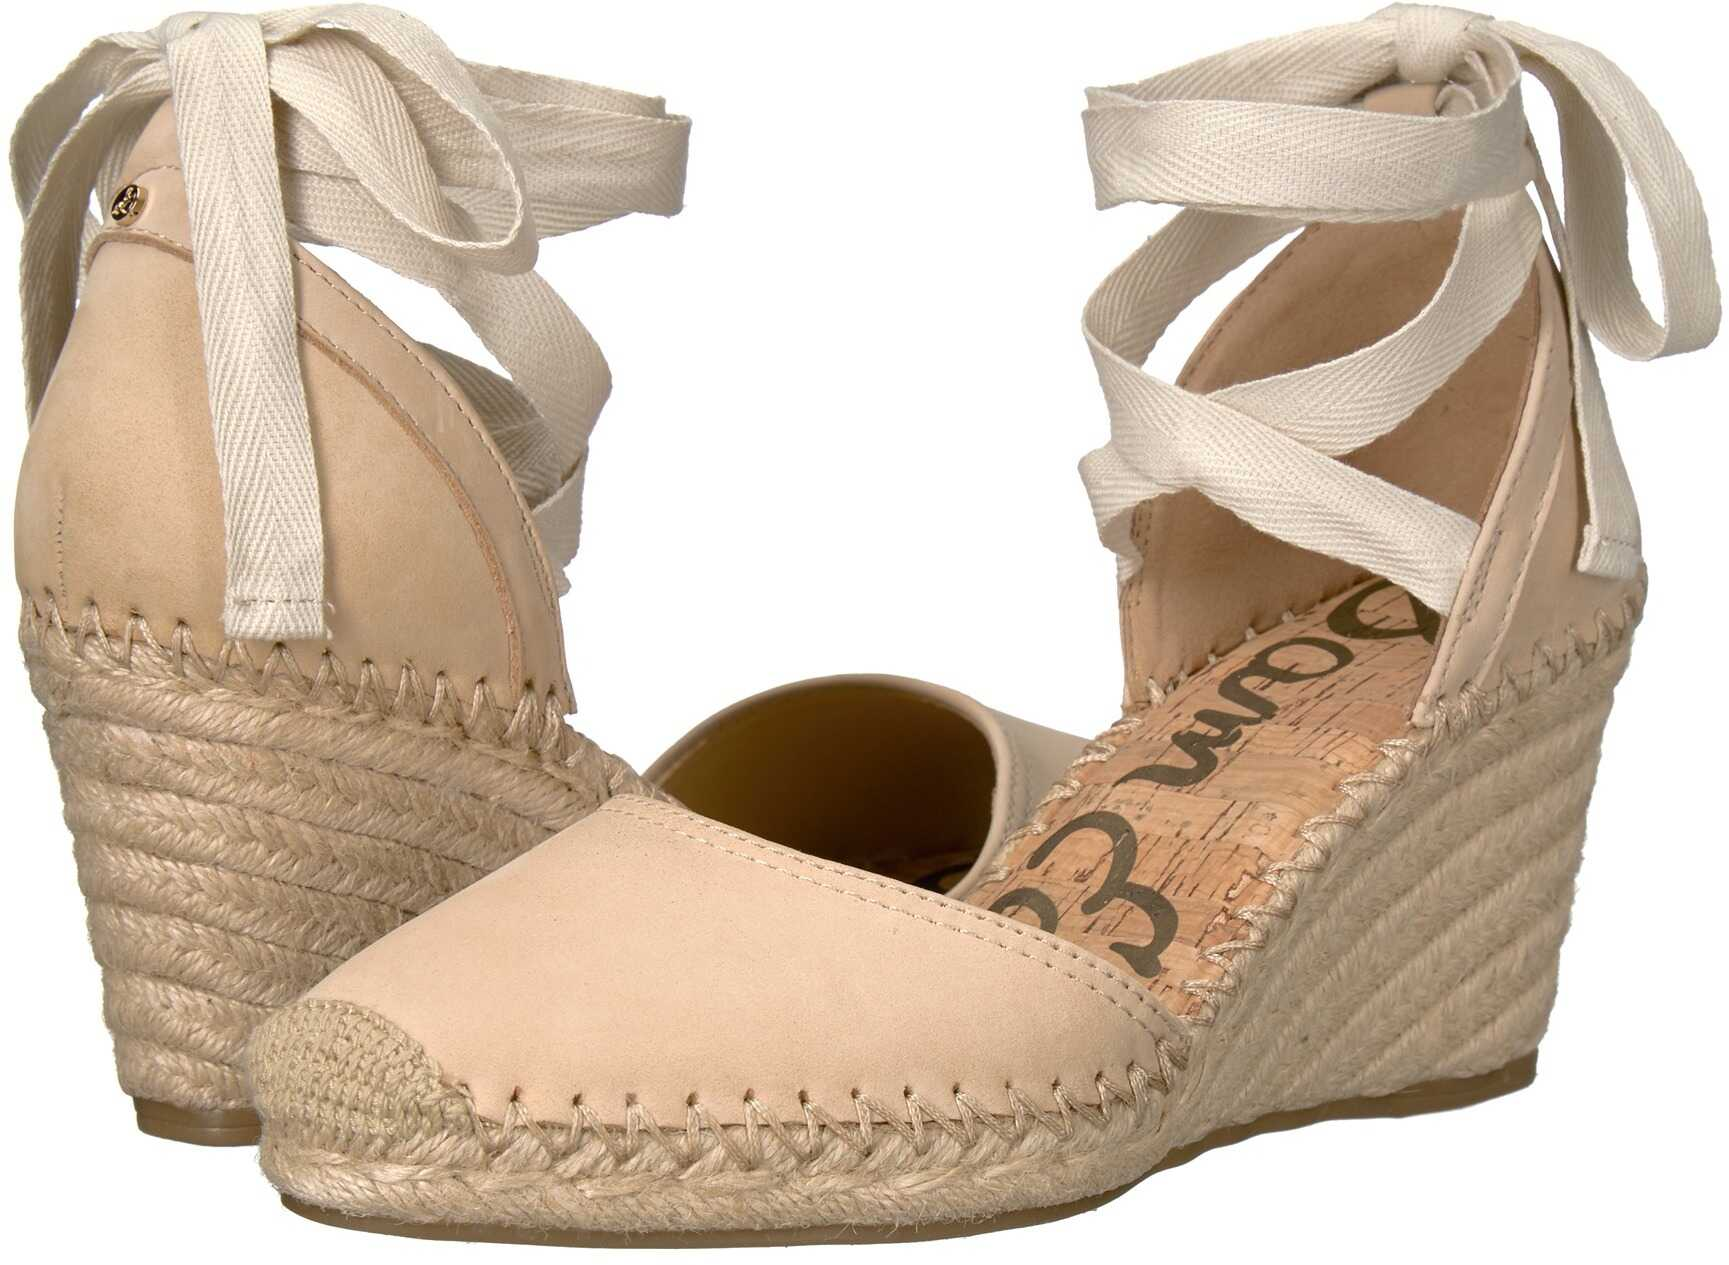 Sam Edelman Patsy Summer Sand Jabuck Nubuck Leather